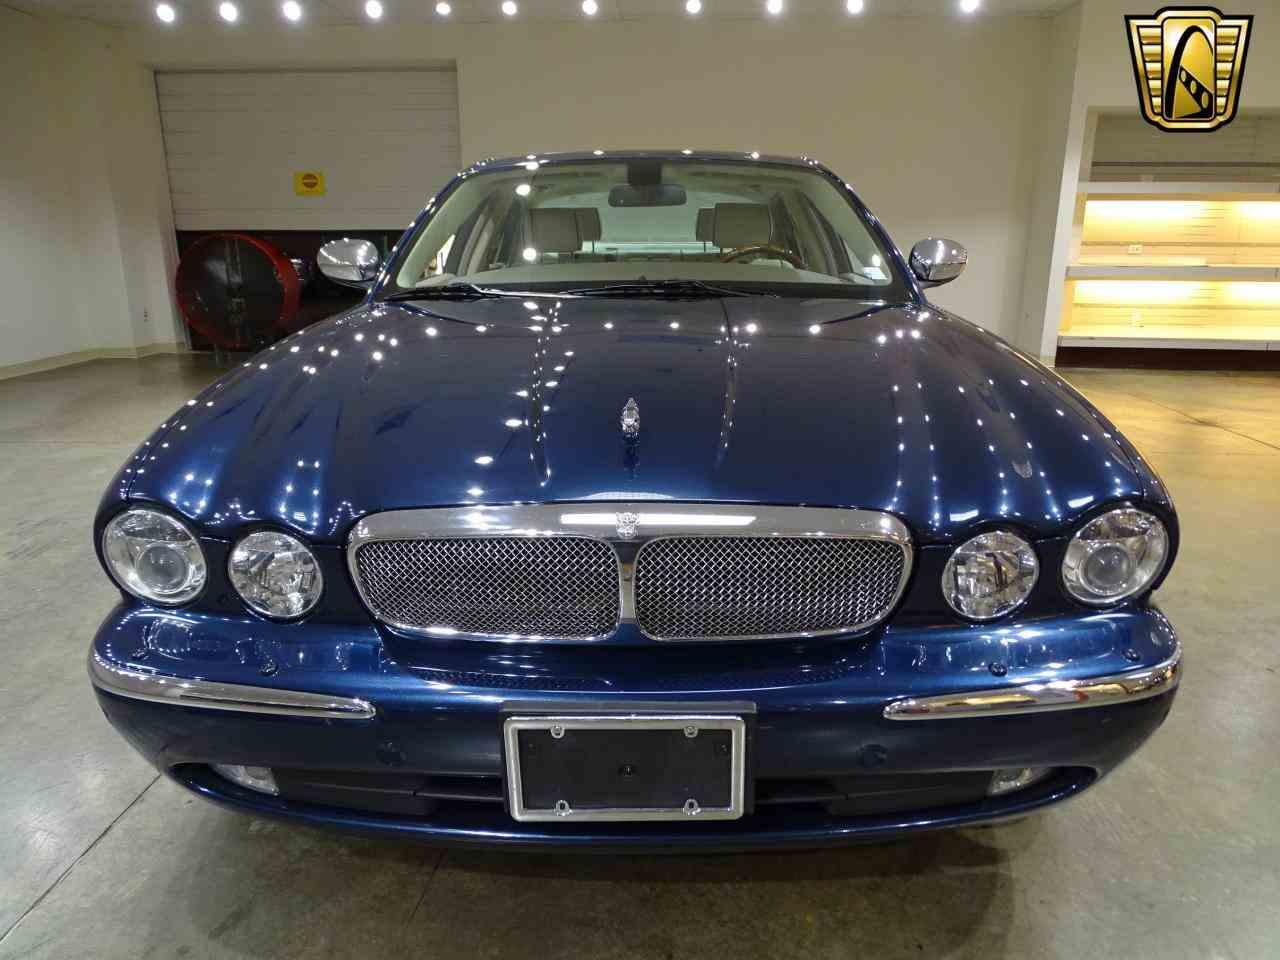 motors jaguar and akron suvs trucks internet price inventory of x used cars type legacy